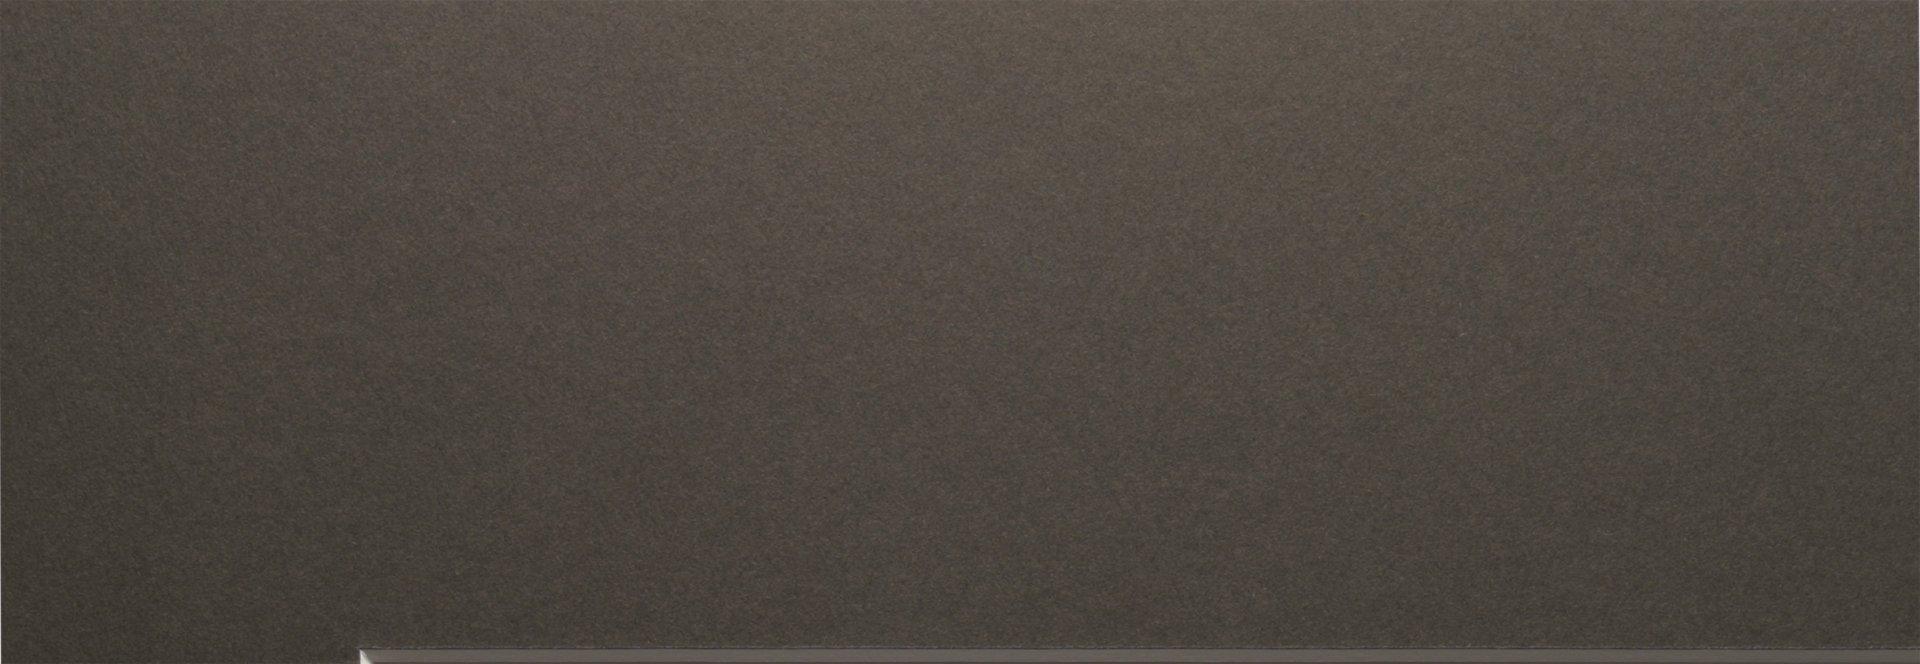 SRM1033 Dark Ash